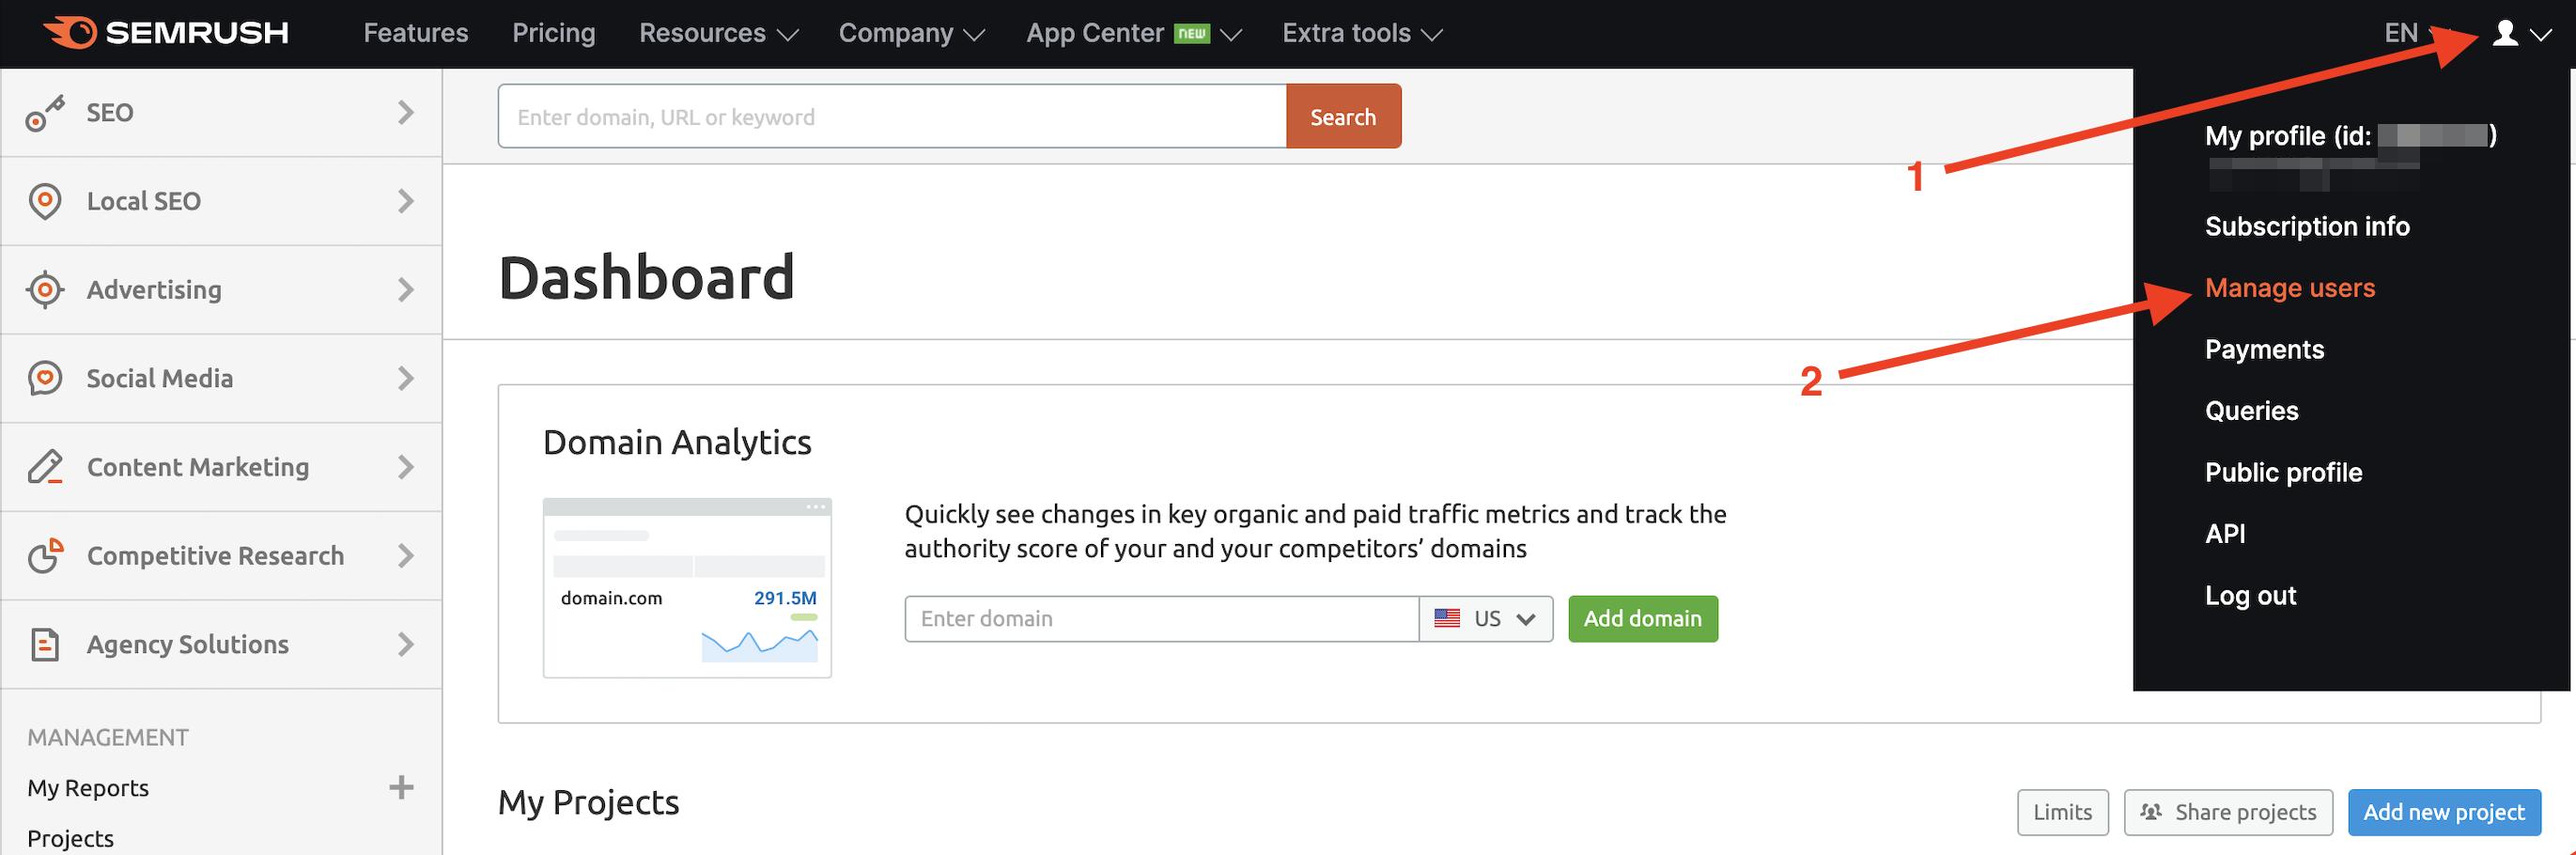 Semrush manage users